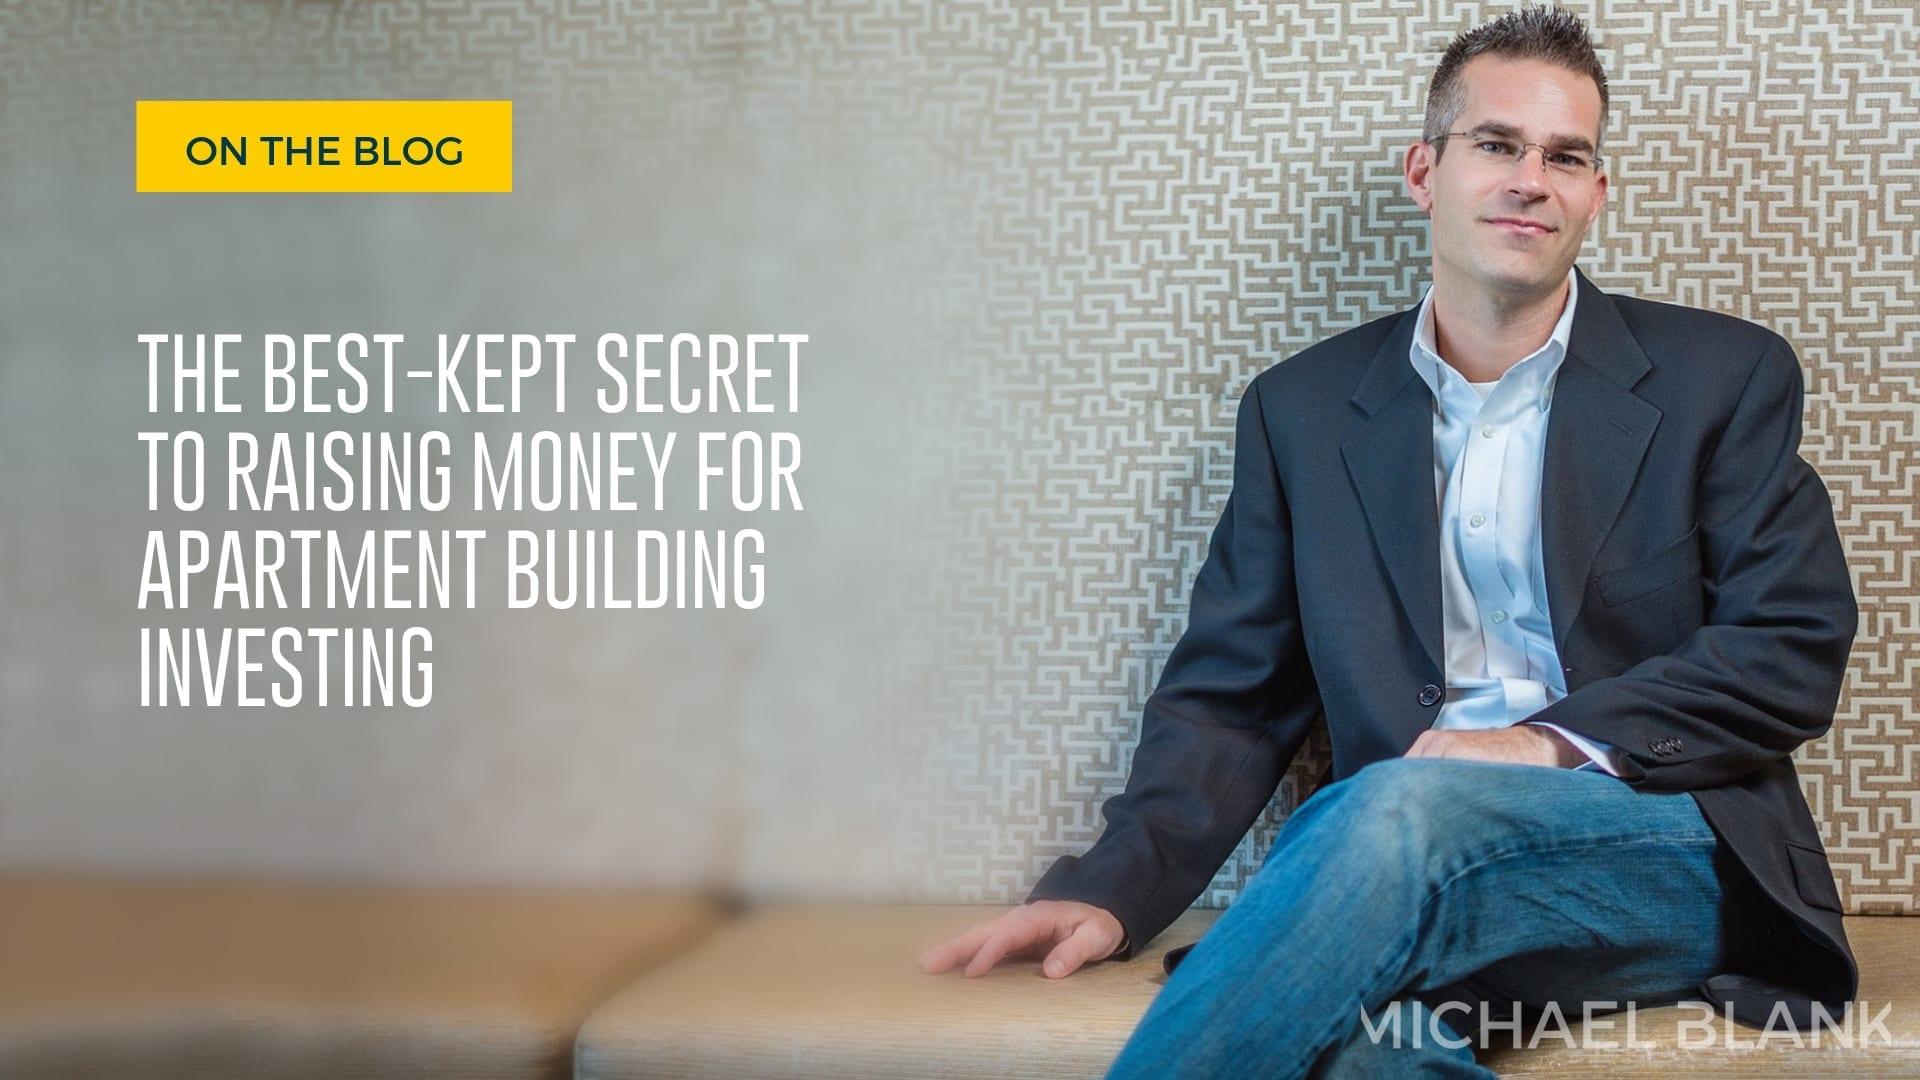 The Best-Kept Secret to Raising Money for Apartment Building Investing